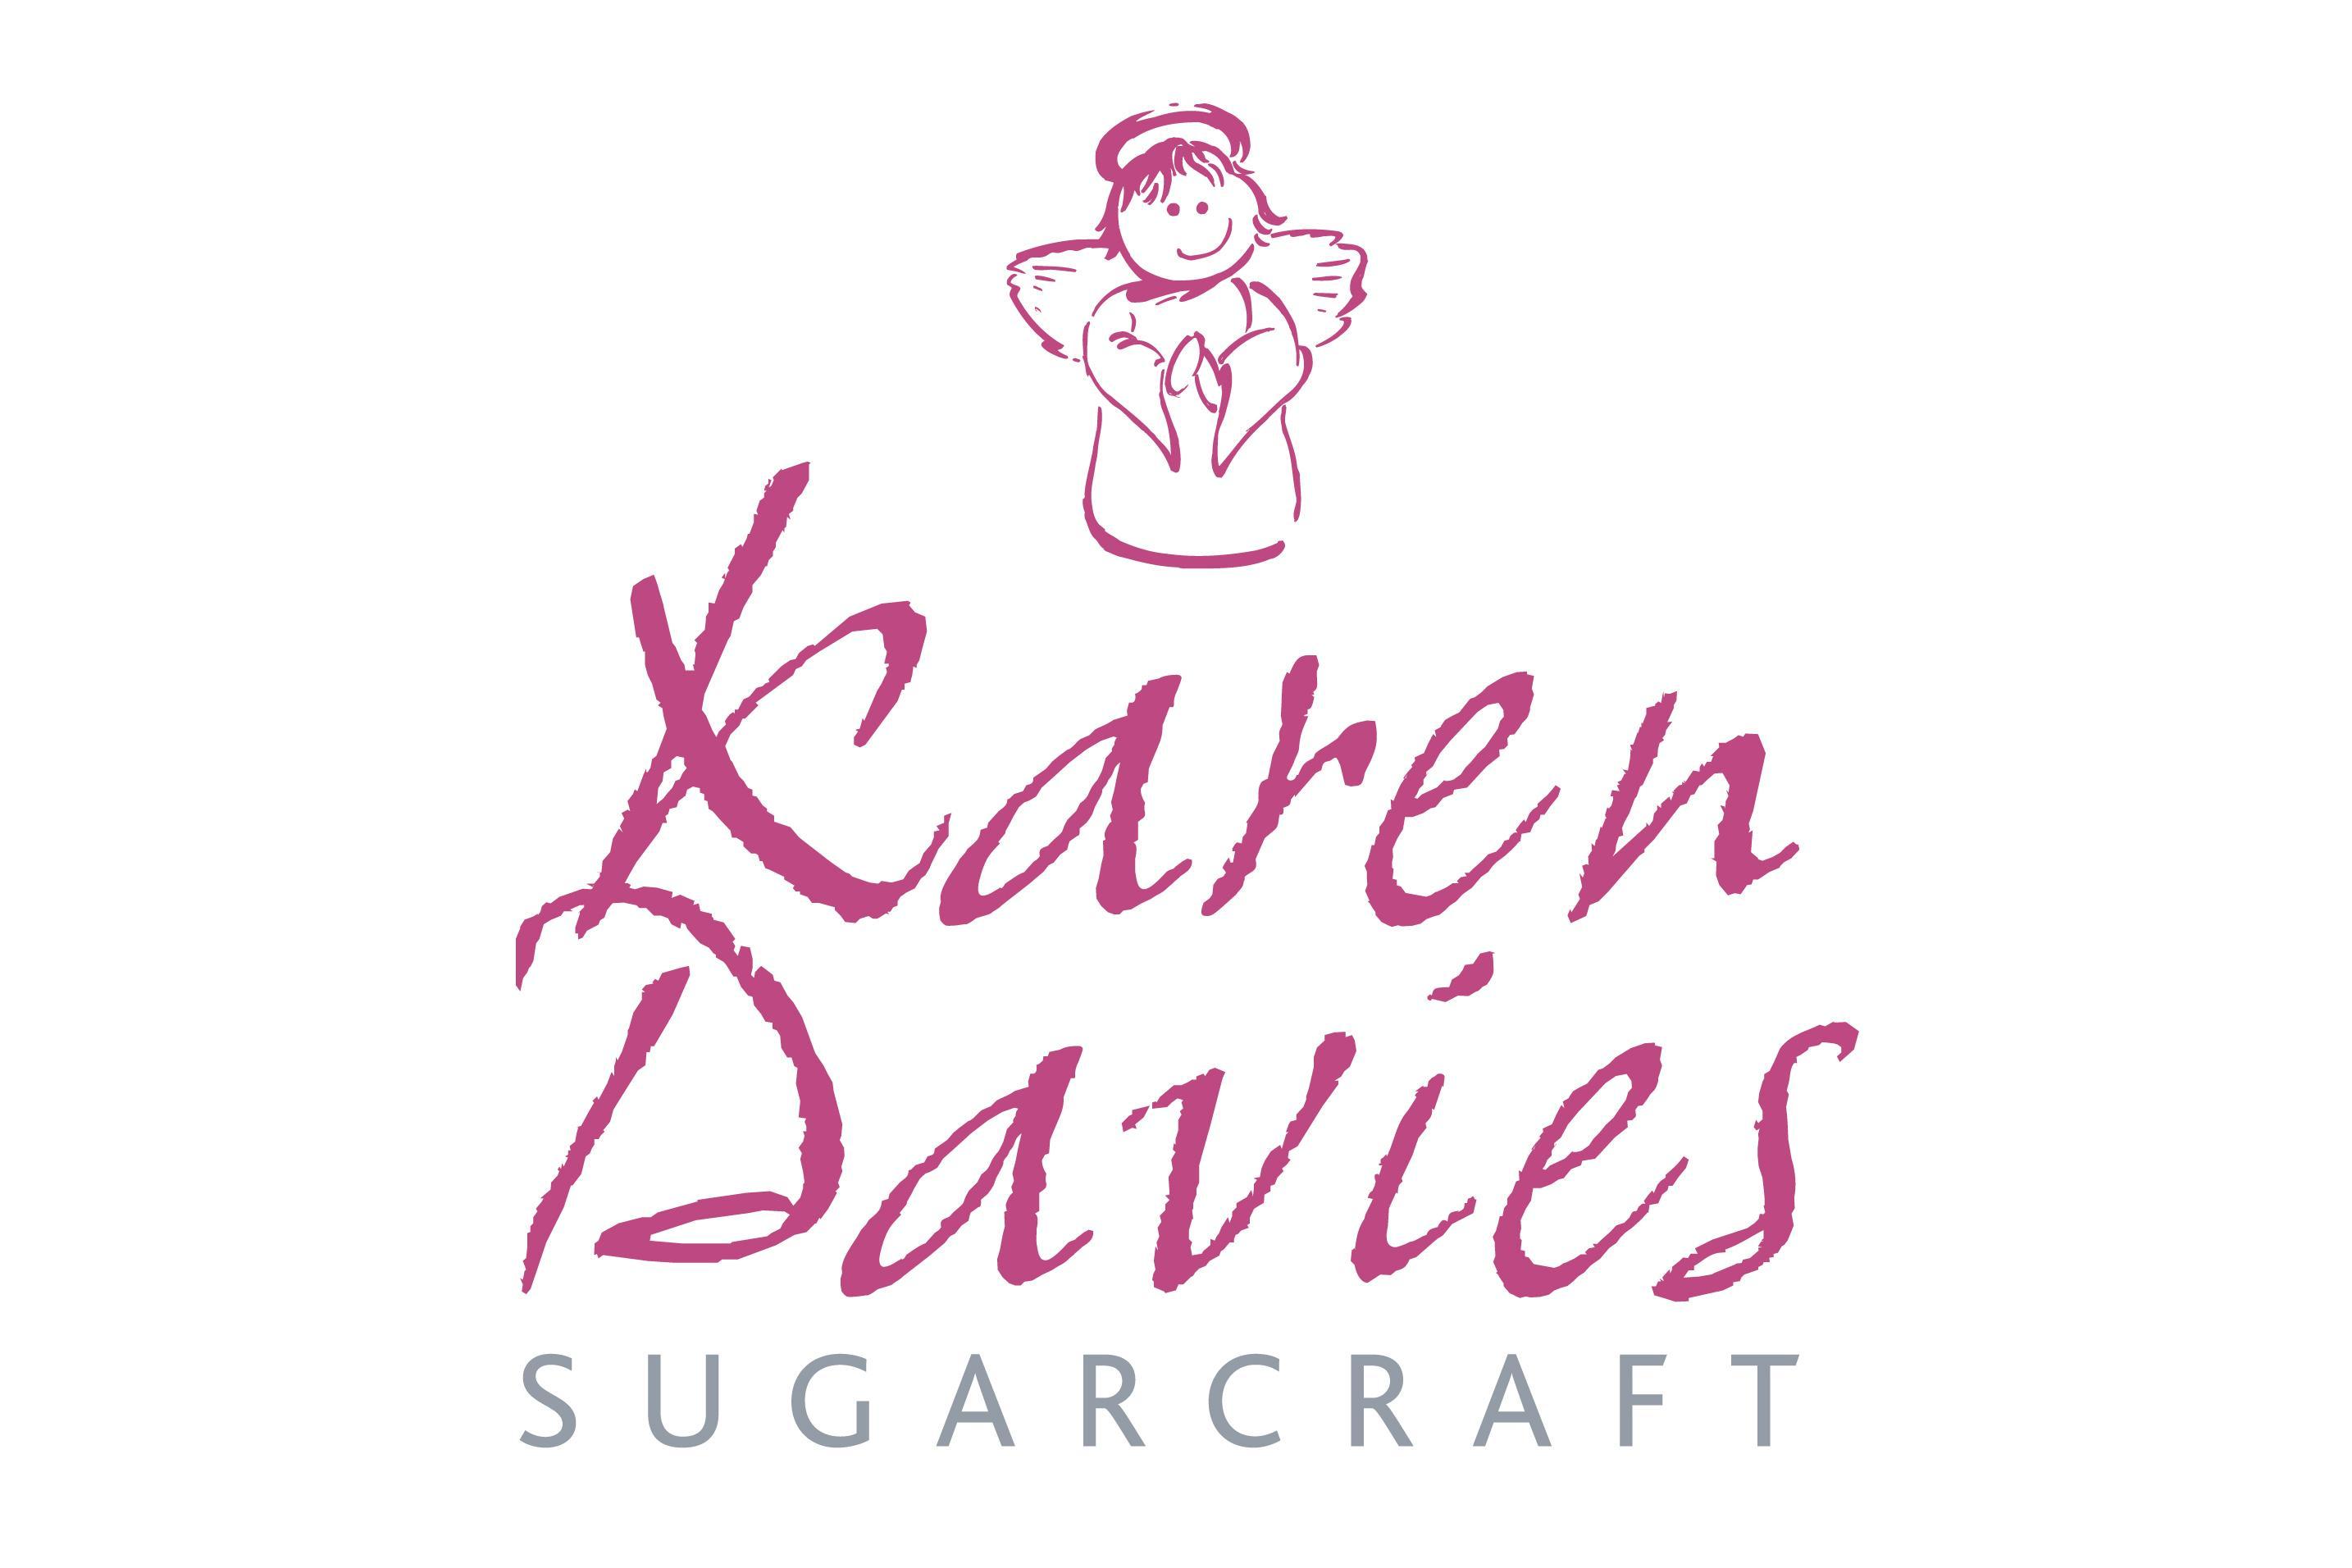 Karen Daives